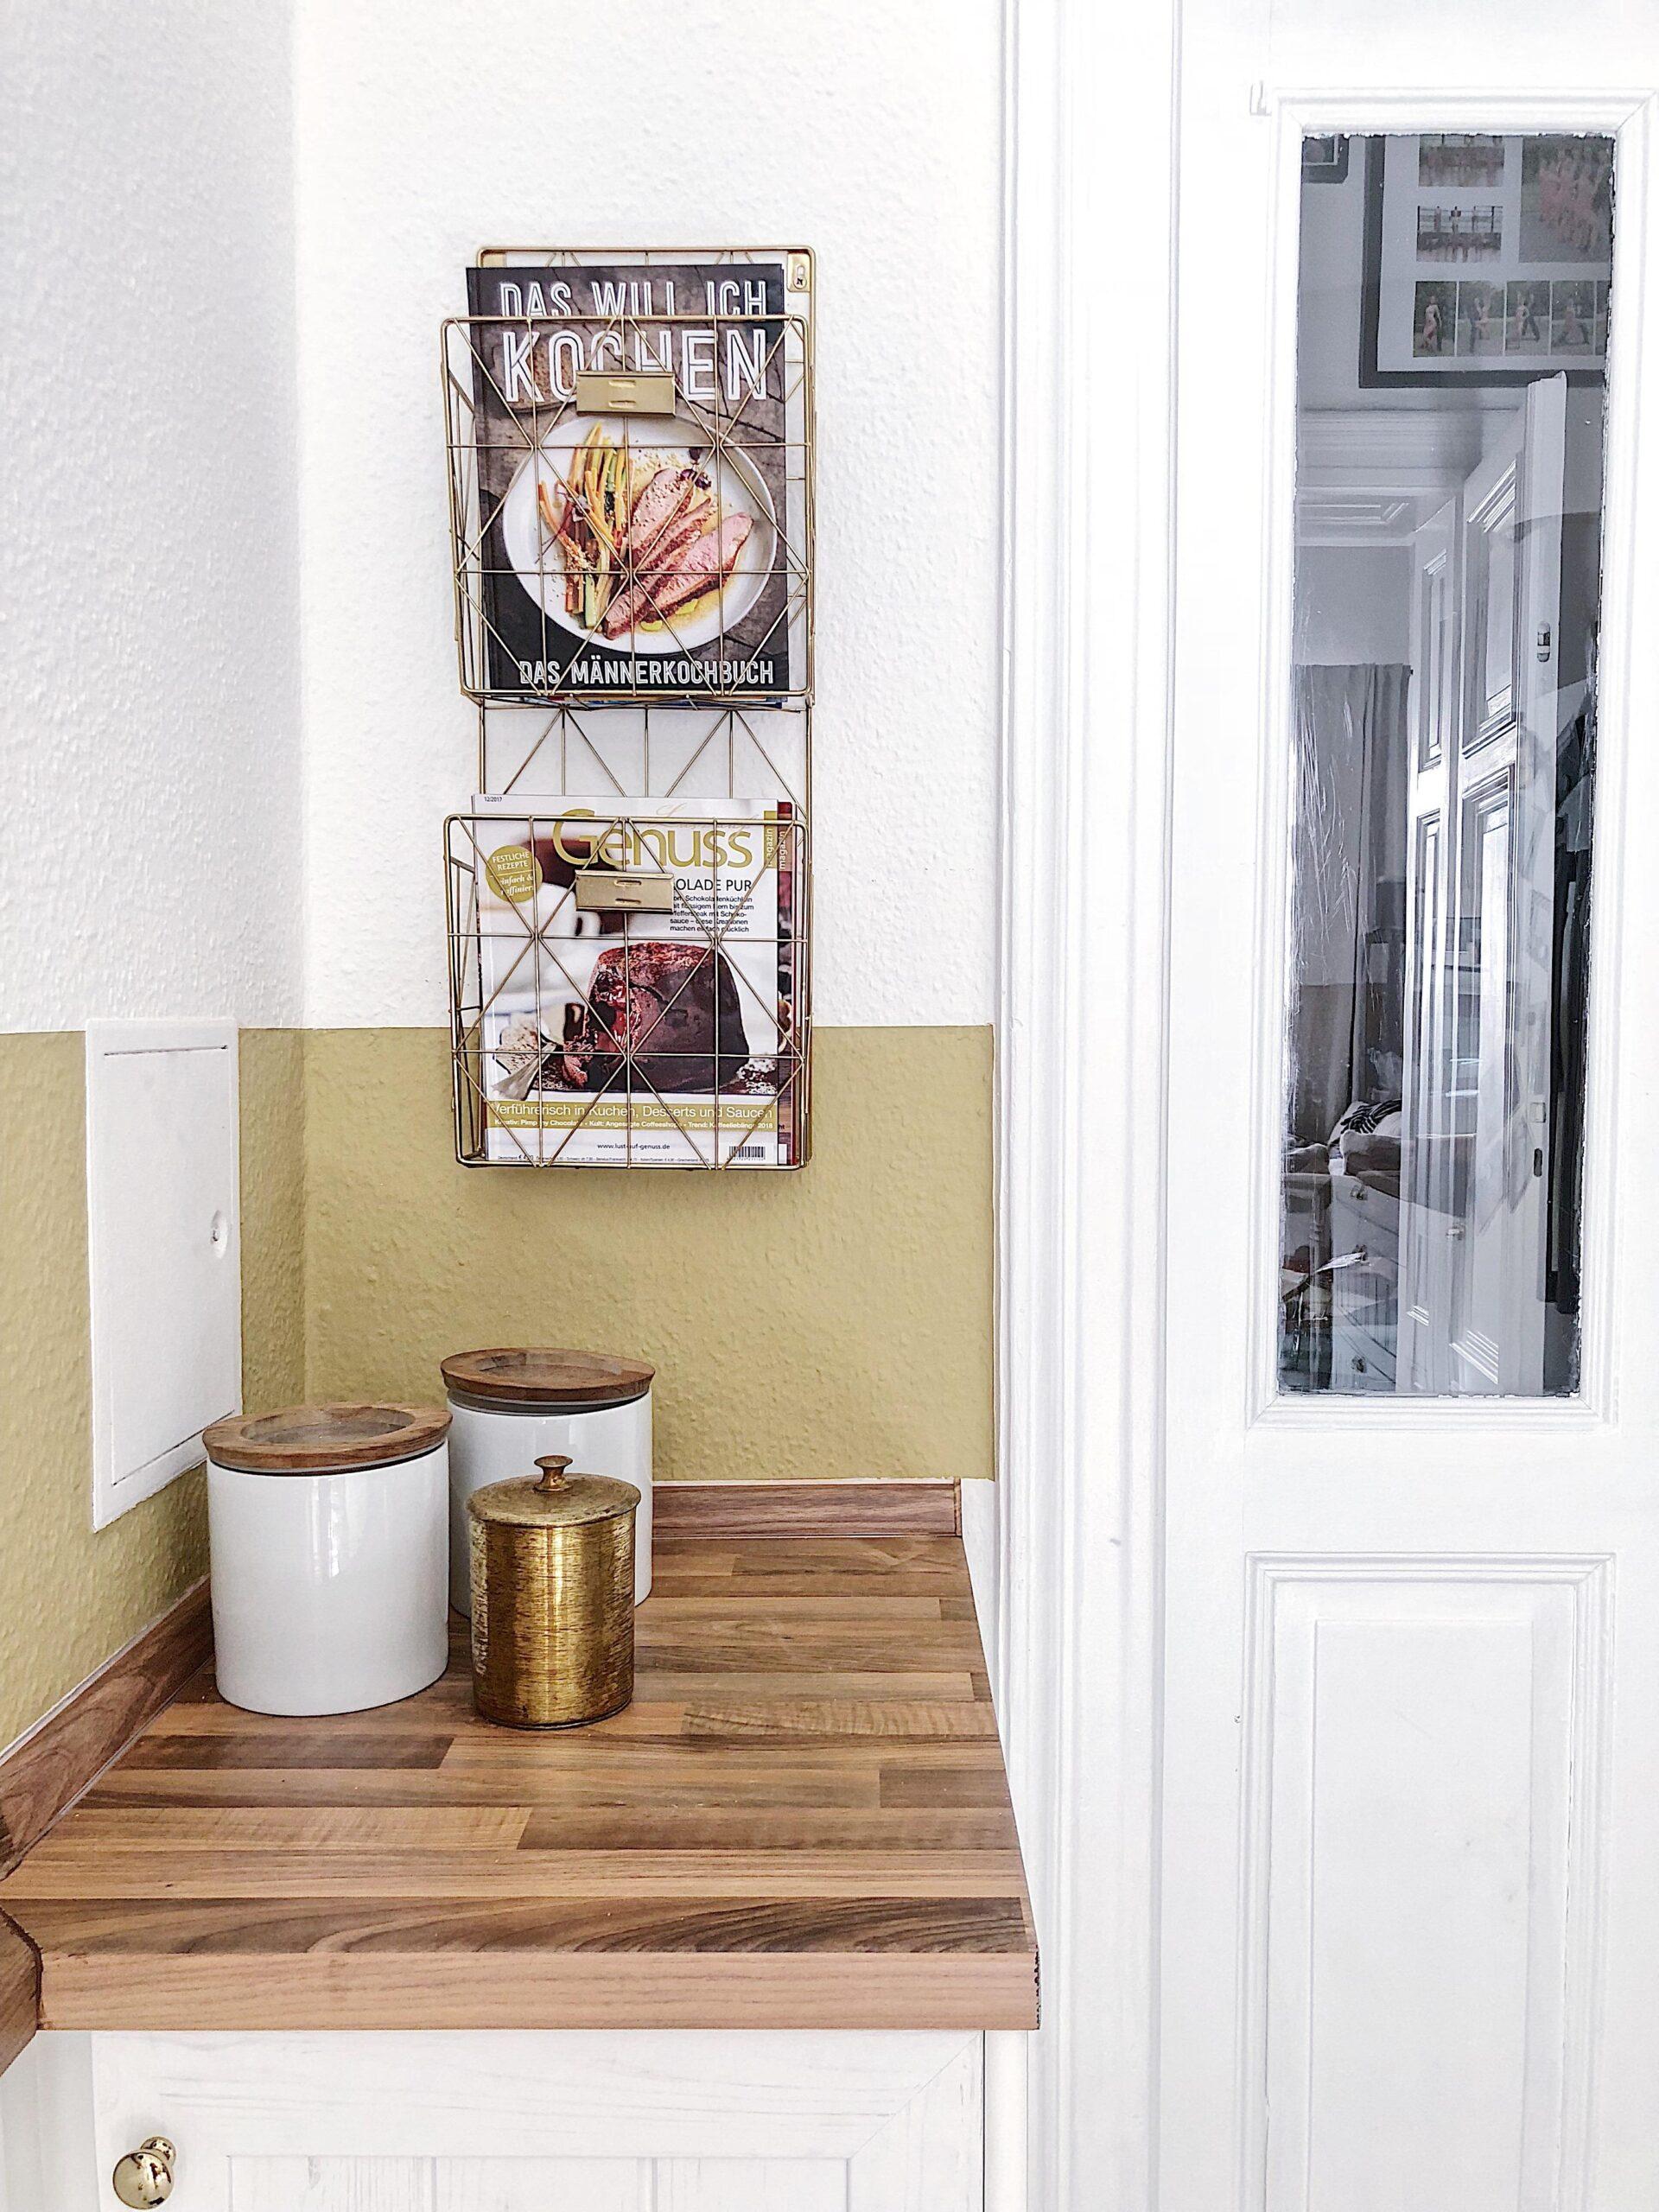 Full Size of Küchen Wandregal Ikea Kche Wandboard Bilder Ideen Couch Betten 160x200 Miniküche Bad Küche Modulküche Sofa Mit Schlaffunktion Regal Kosten Kaufen Bei Wohnzimmer Küchen Wandregal Ikea